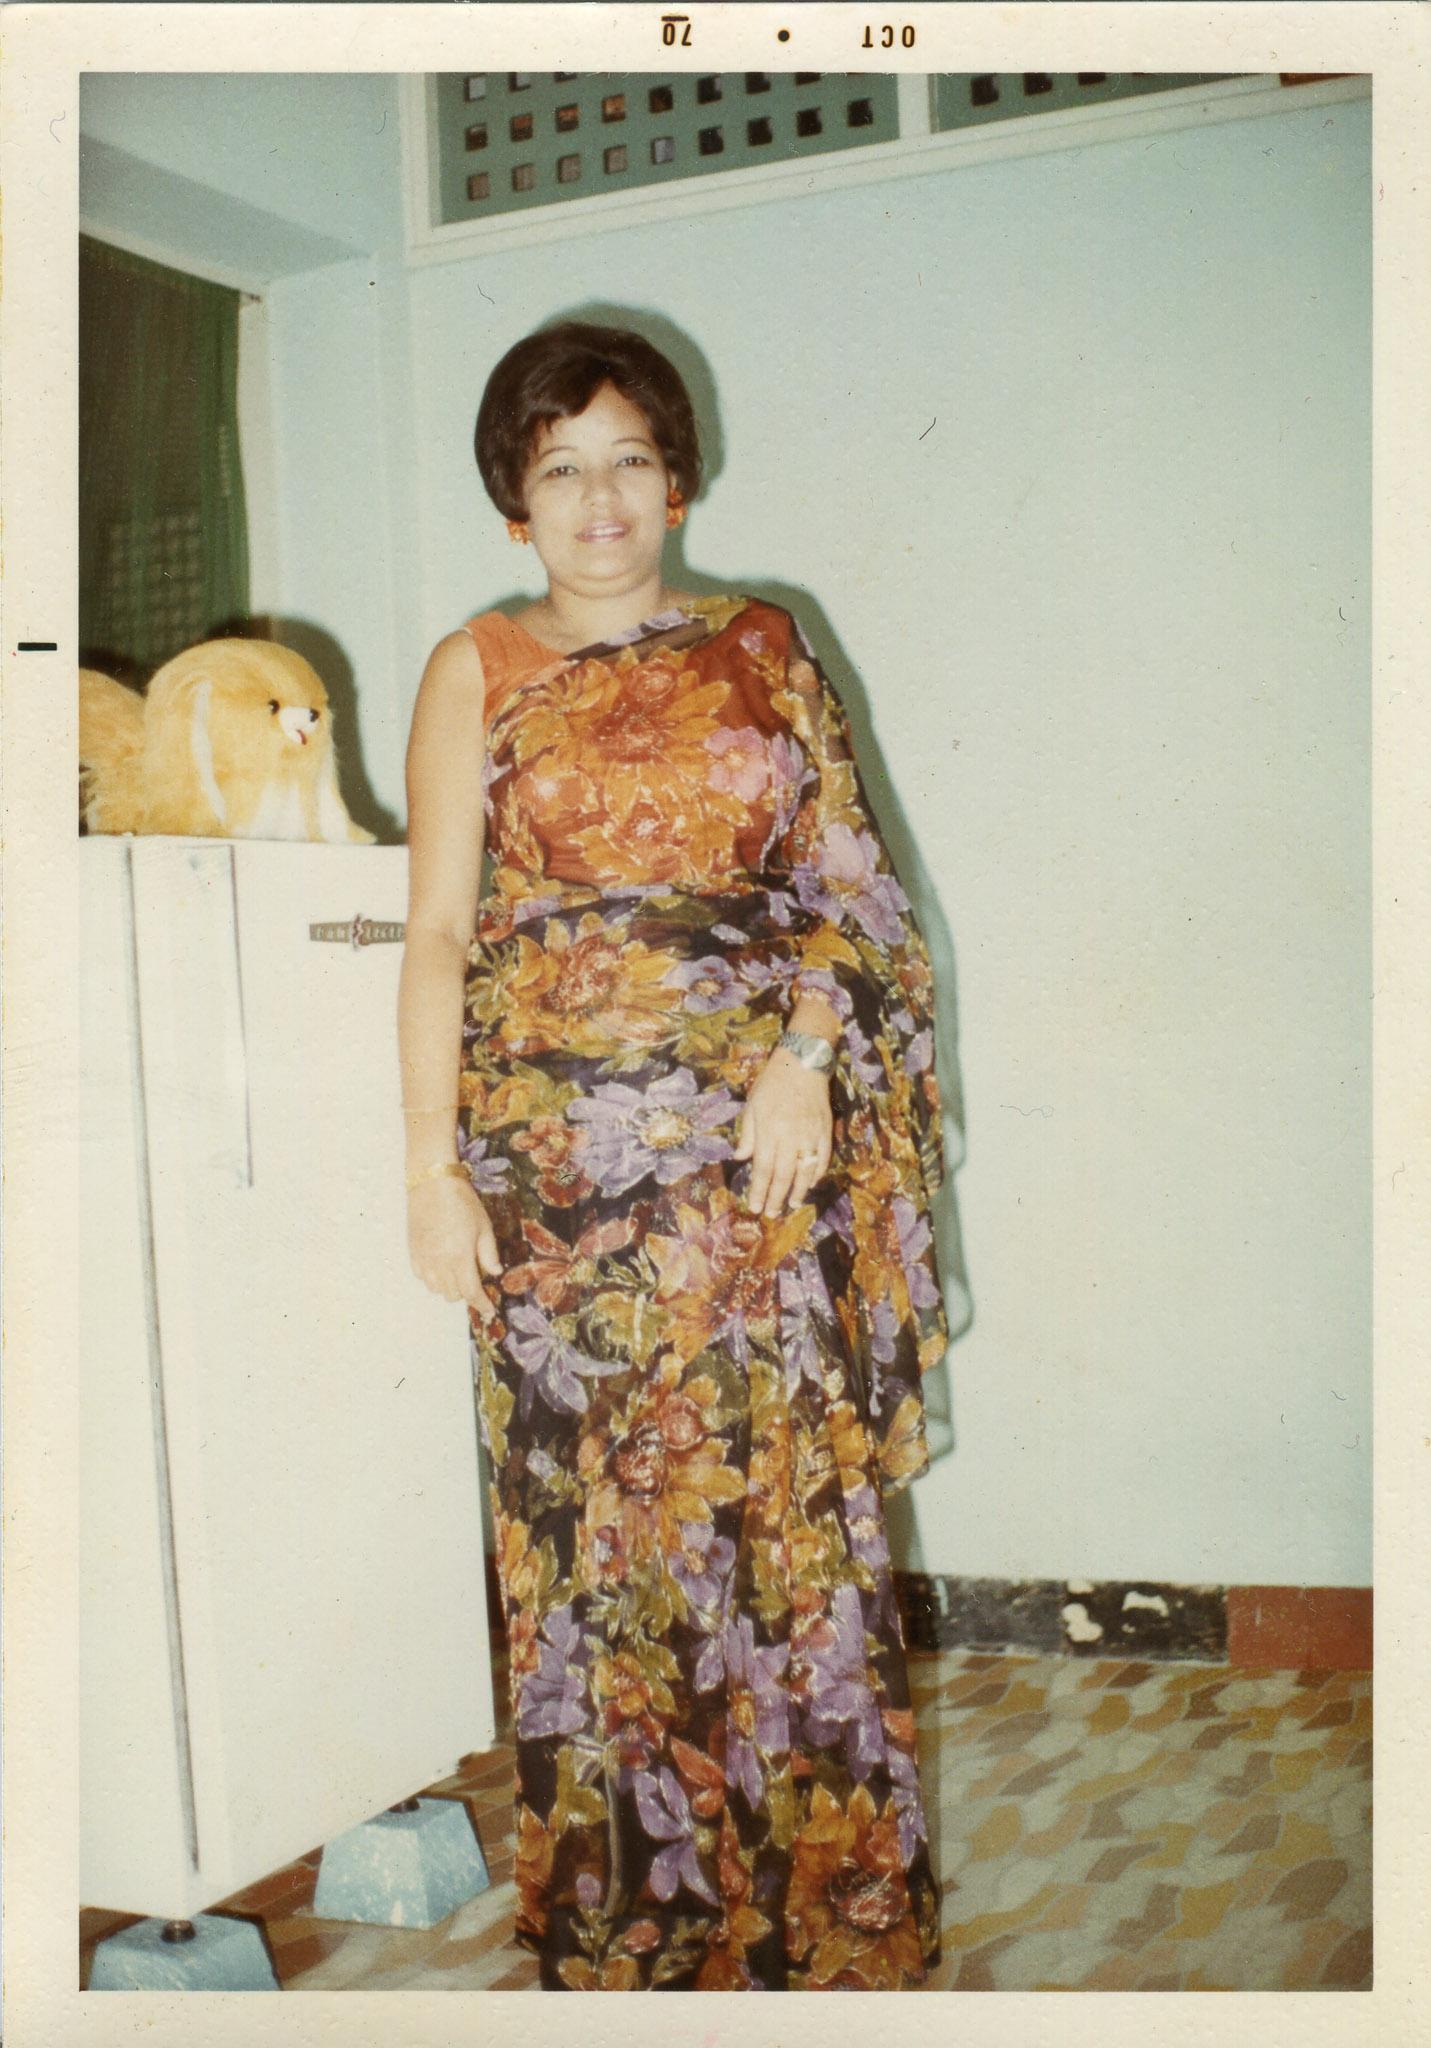 singapore-gurkhas-archive-photo-museum-zakaria-zainal-51.jpg